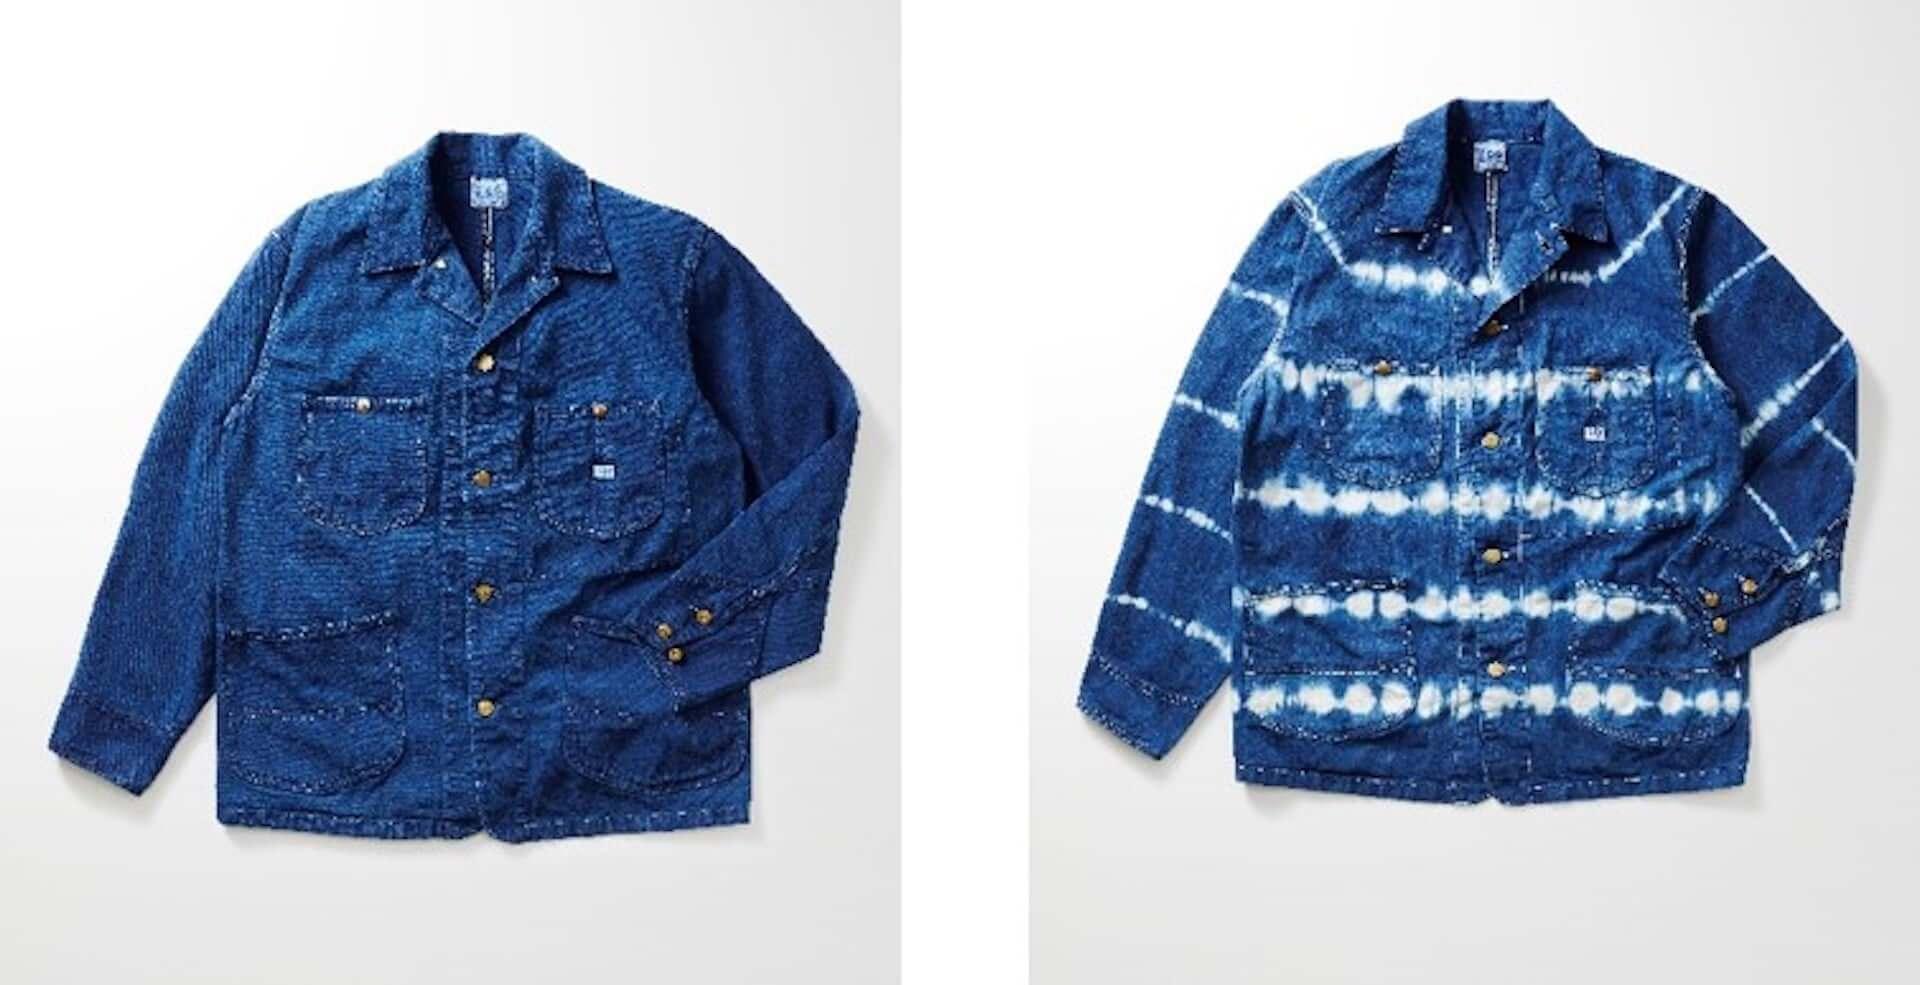 Lee原宿店で今夏注目の天然インディゴ染めTシャツやジャケットが移転1周年記念限定発売! lf200529_lee_indigo_2-1920x985